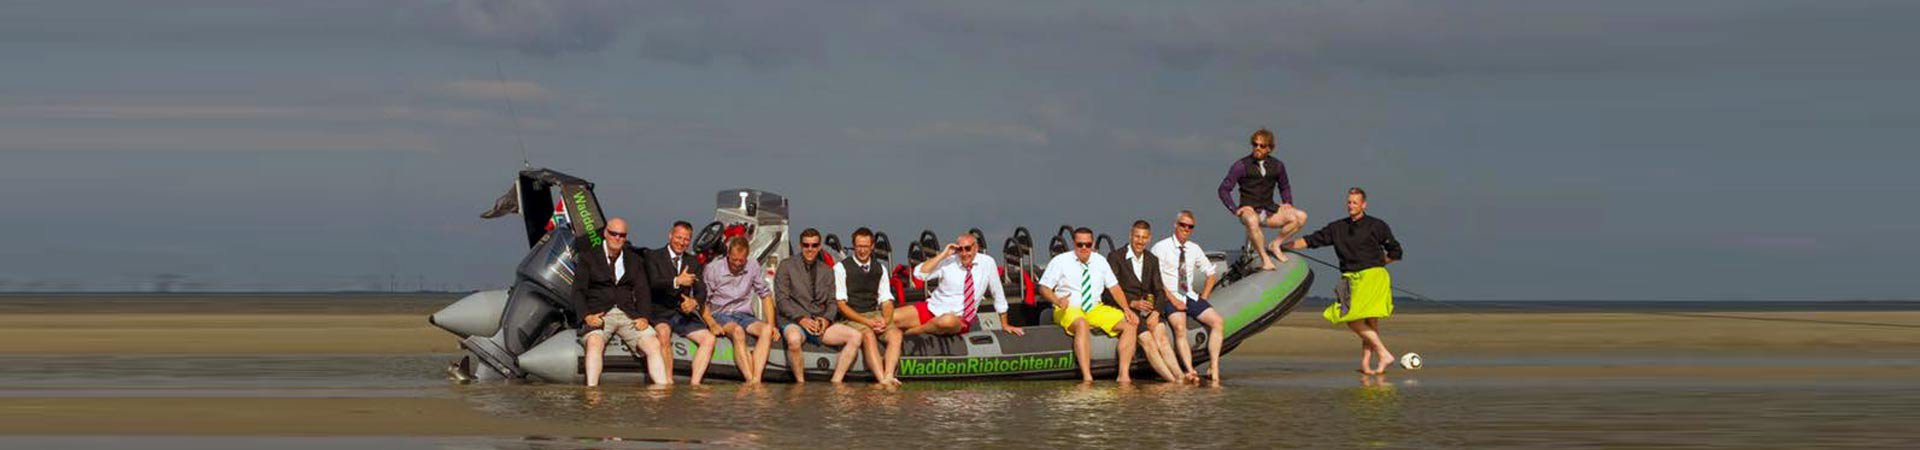 Vrijgezellenfeest Waddenribtochten Groningen Delfzijl Eemshaven Waddenzee